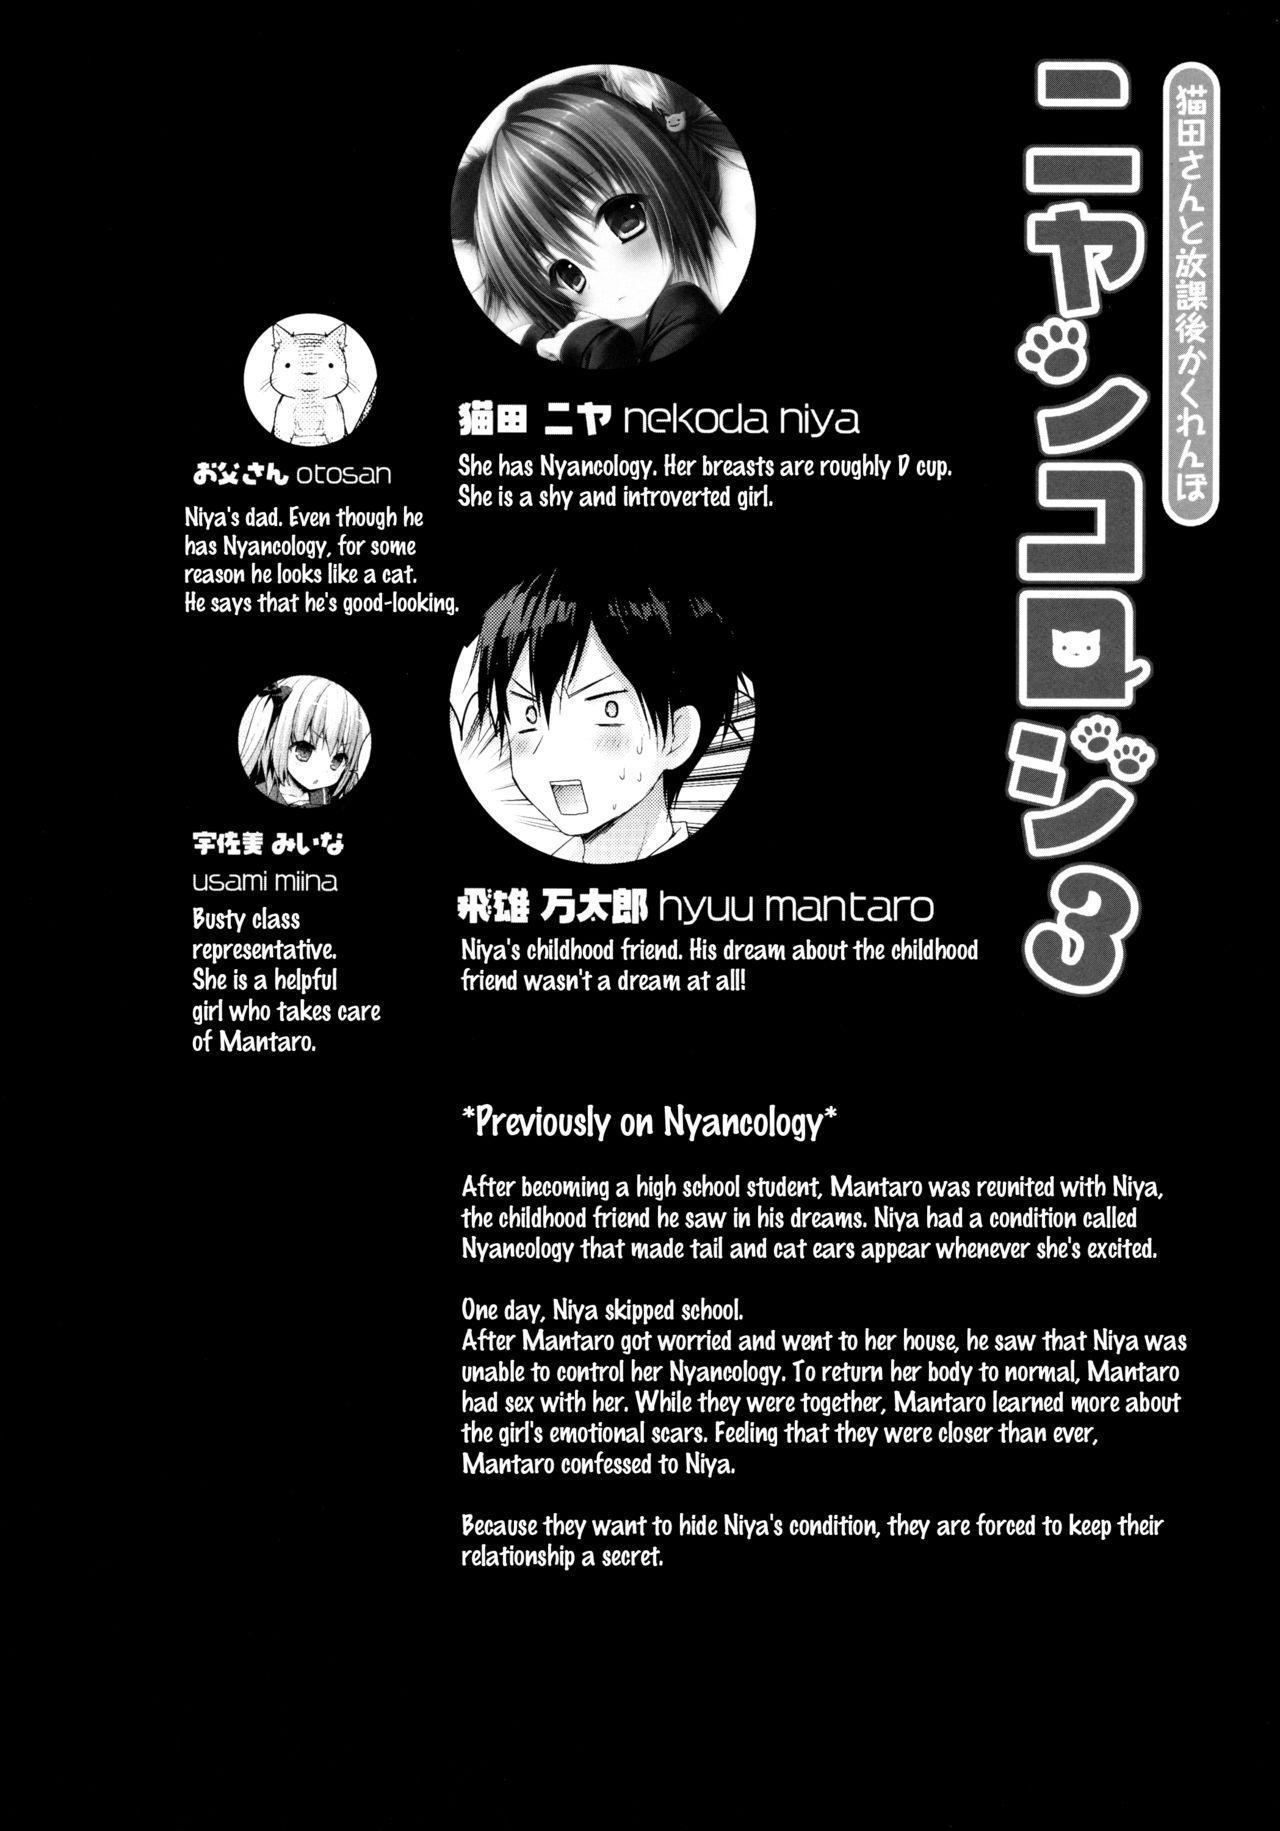 (Mimiket 30) [Kinokonomi (konomi)] Nyancology 3 -Nekota-san to Houkago Kakurenbo- | Nyancology 3 -After School Hide and Seek With A Catgirl- [English] [Doujins.com] 3